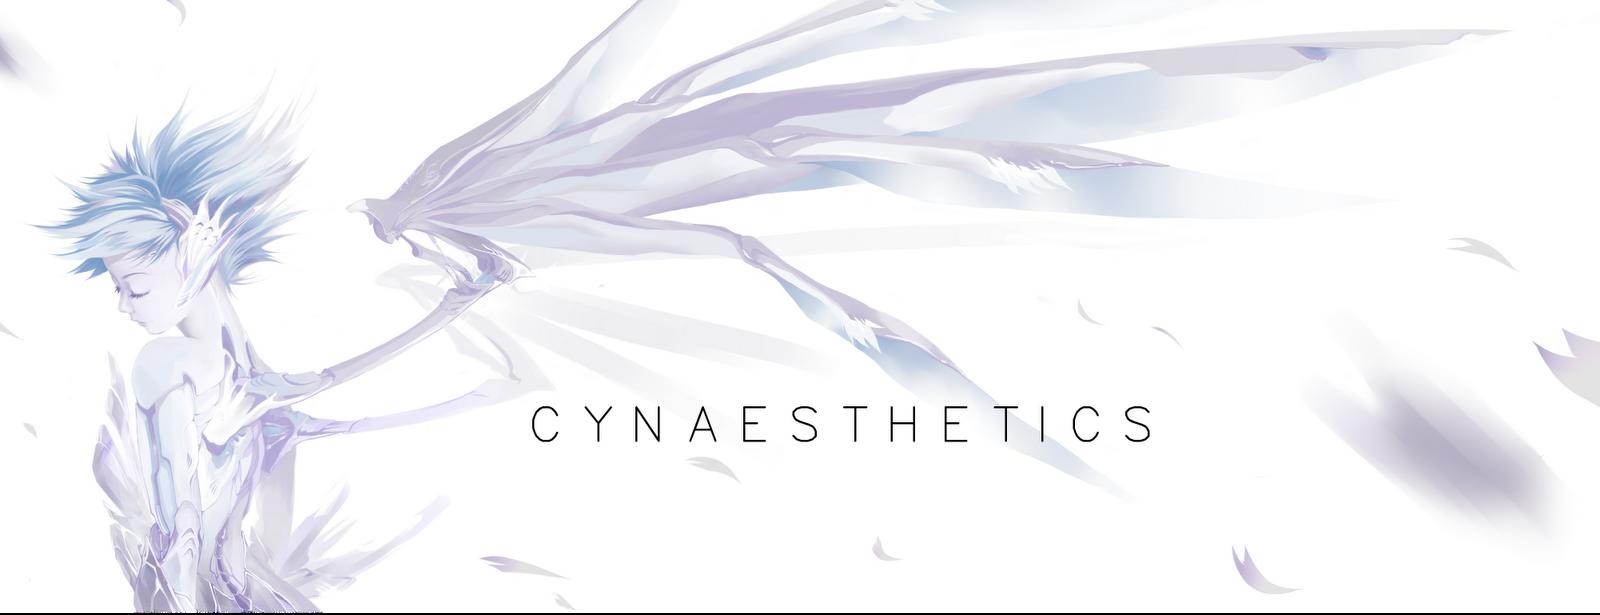 cynaesthetics